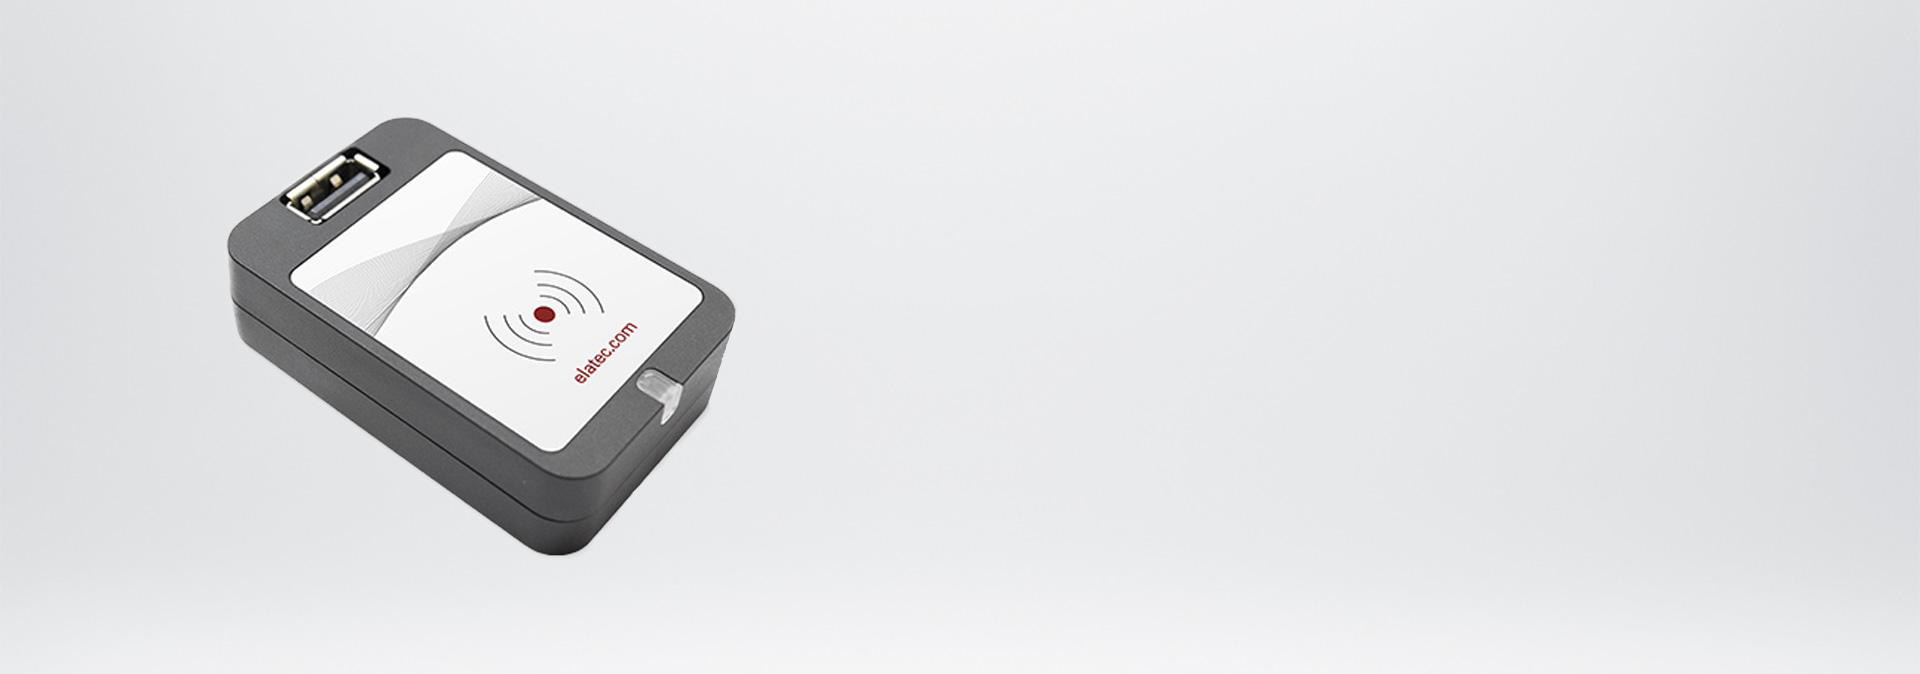 Elatec TWN4 USB Front Reader